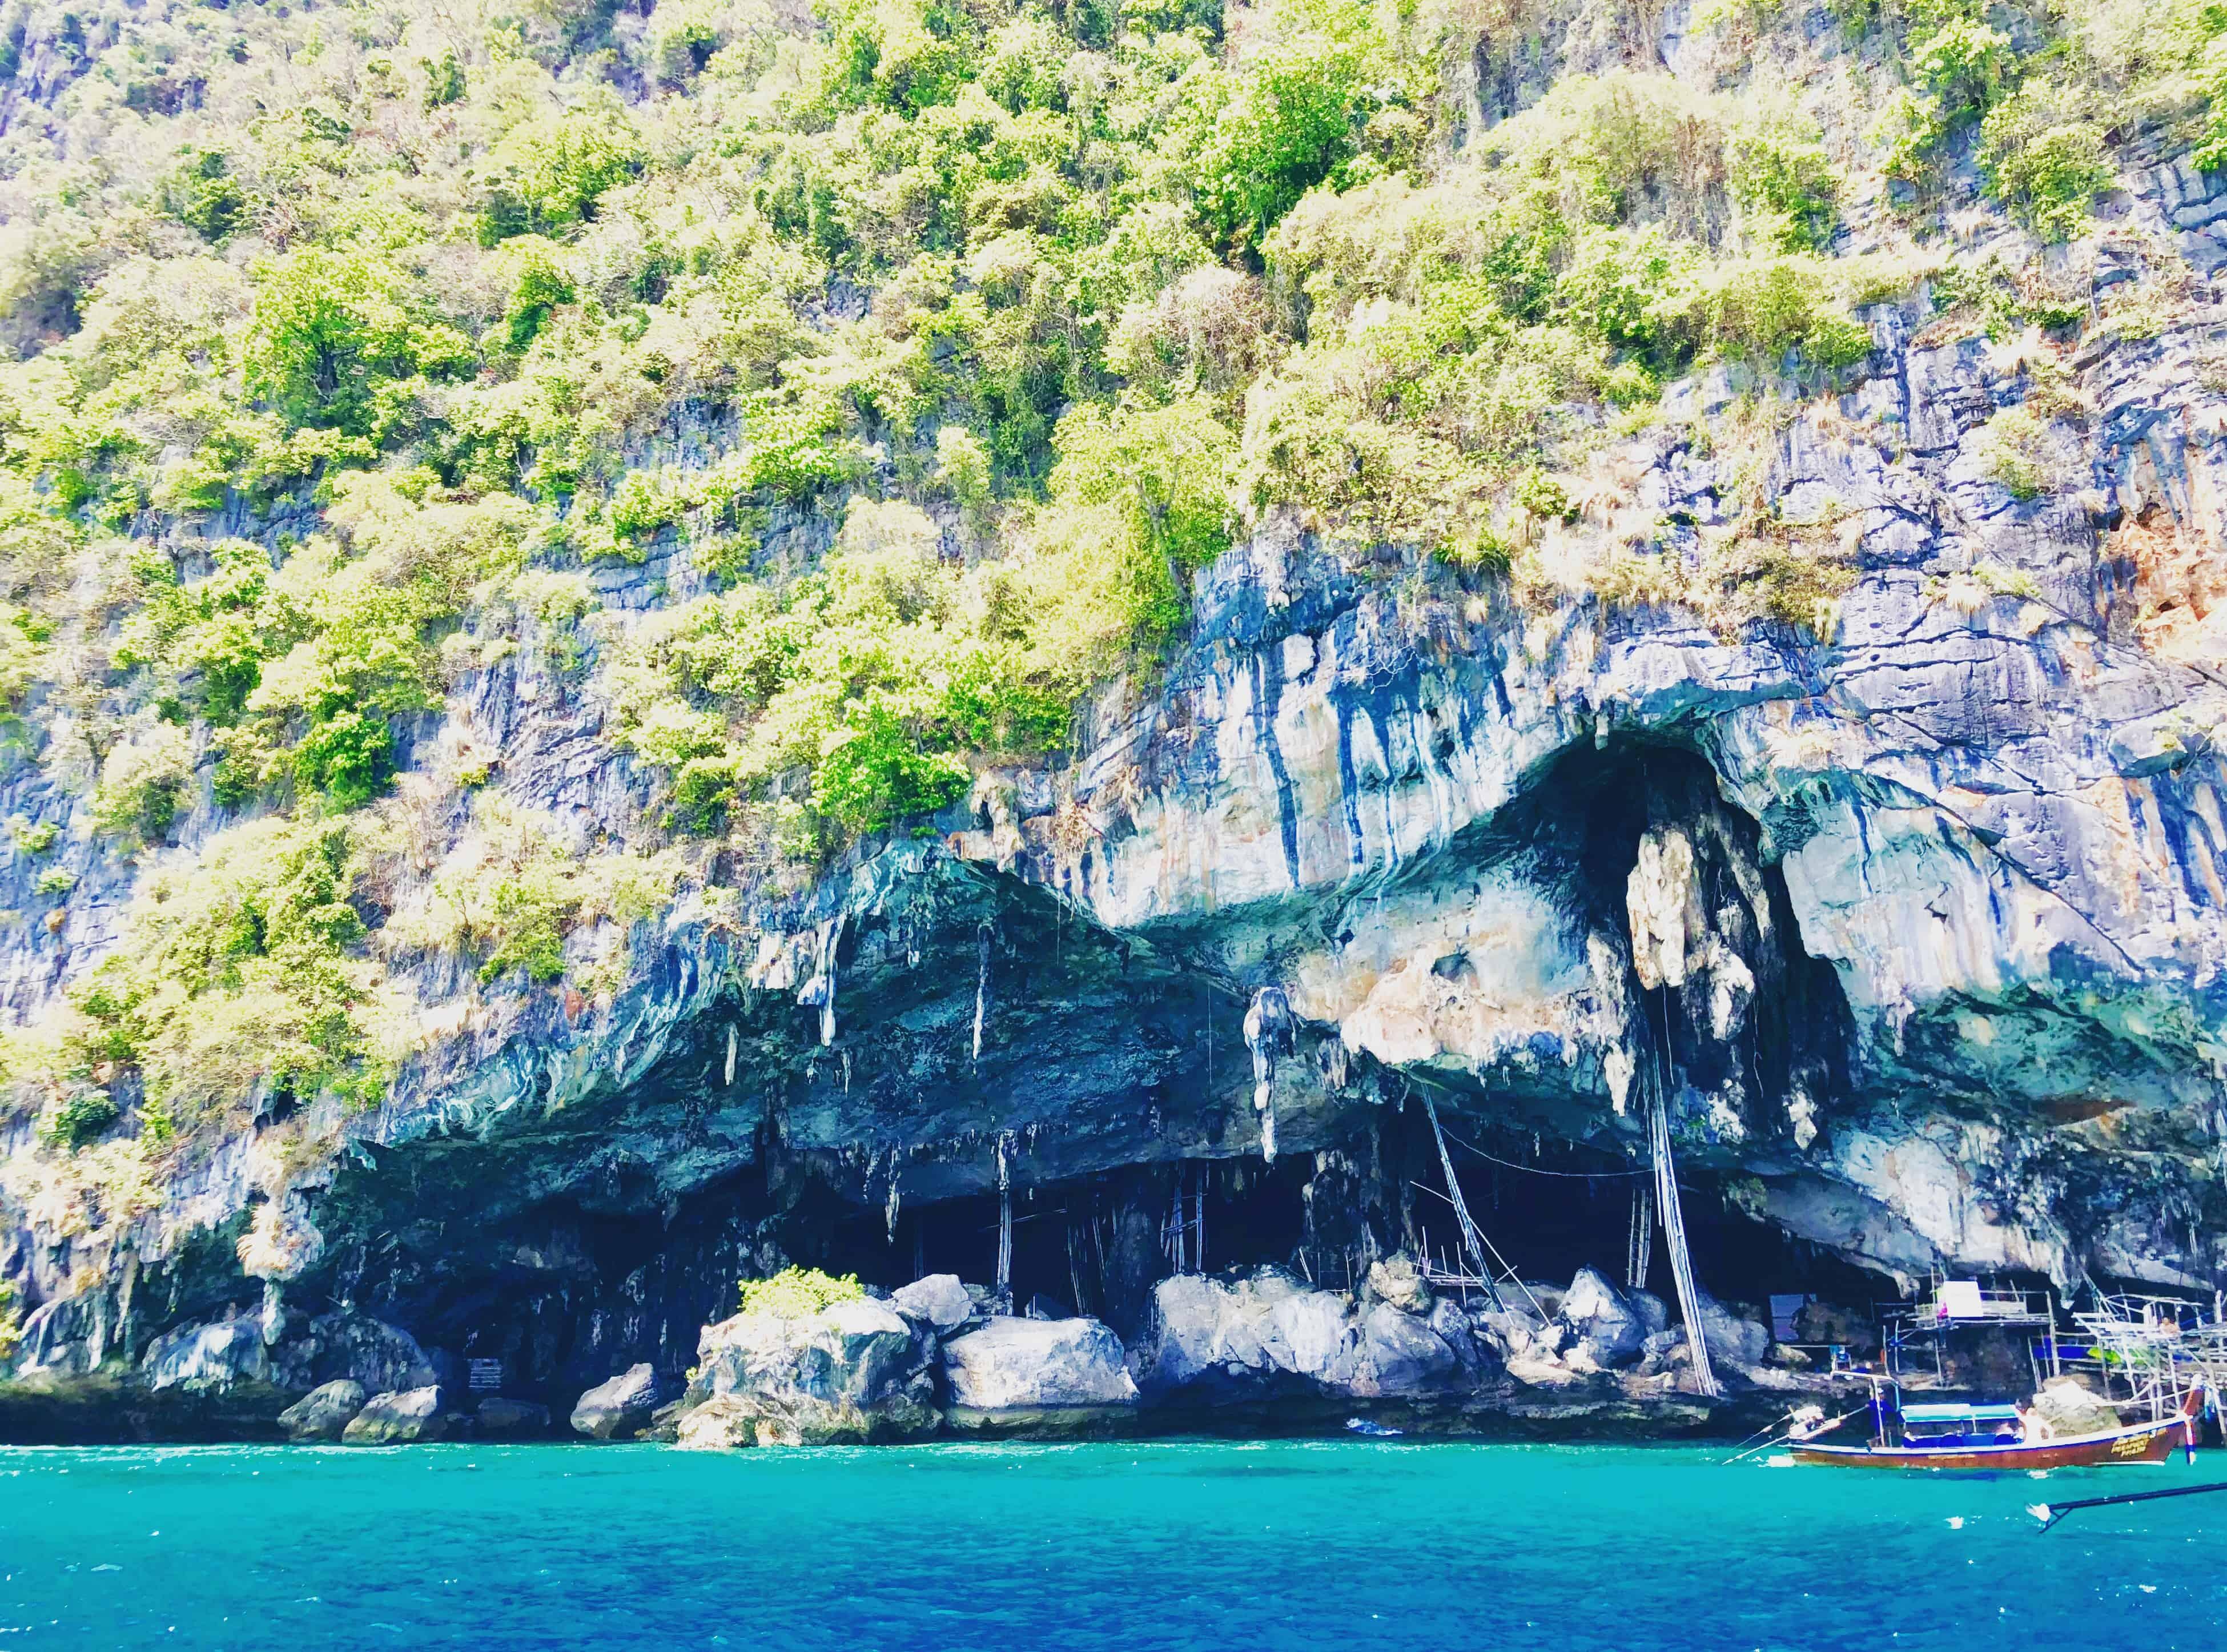 phuket, thailand itinerary